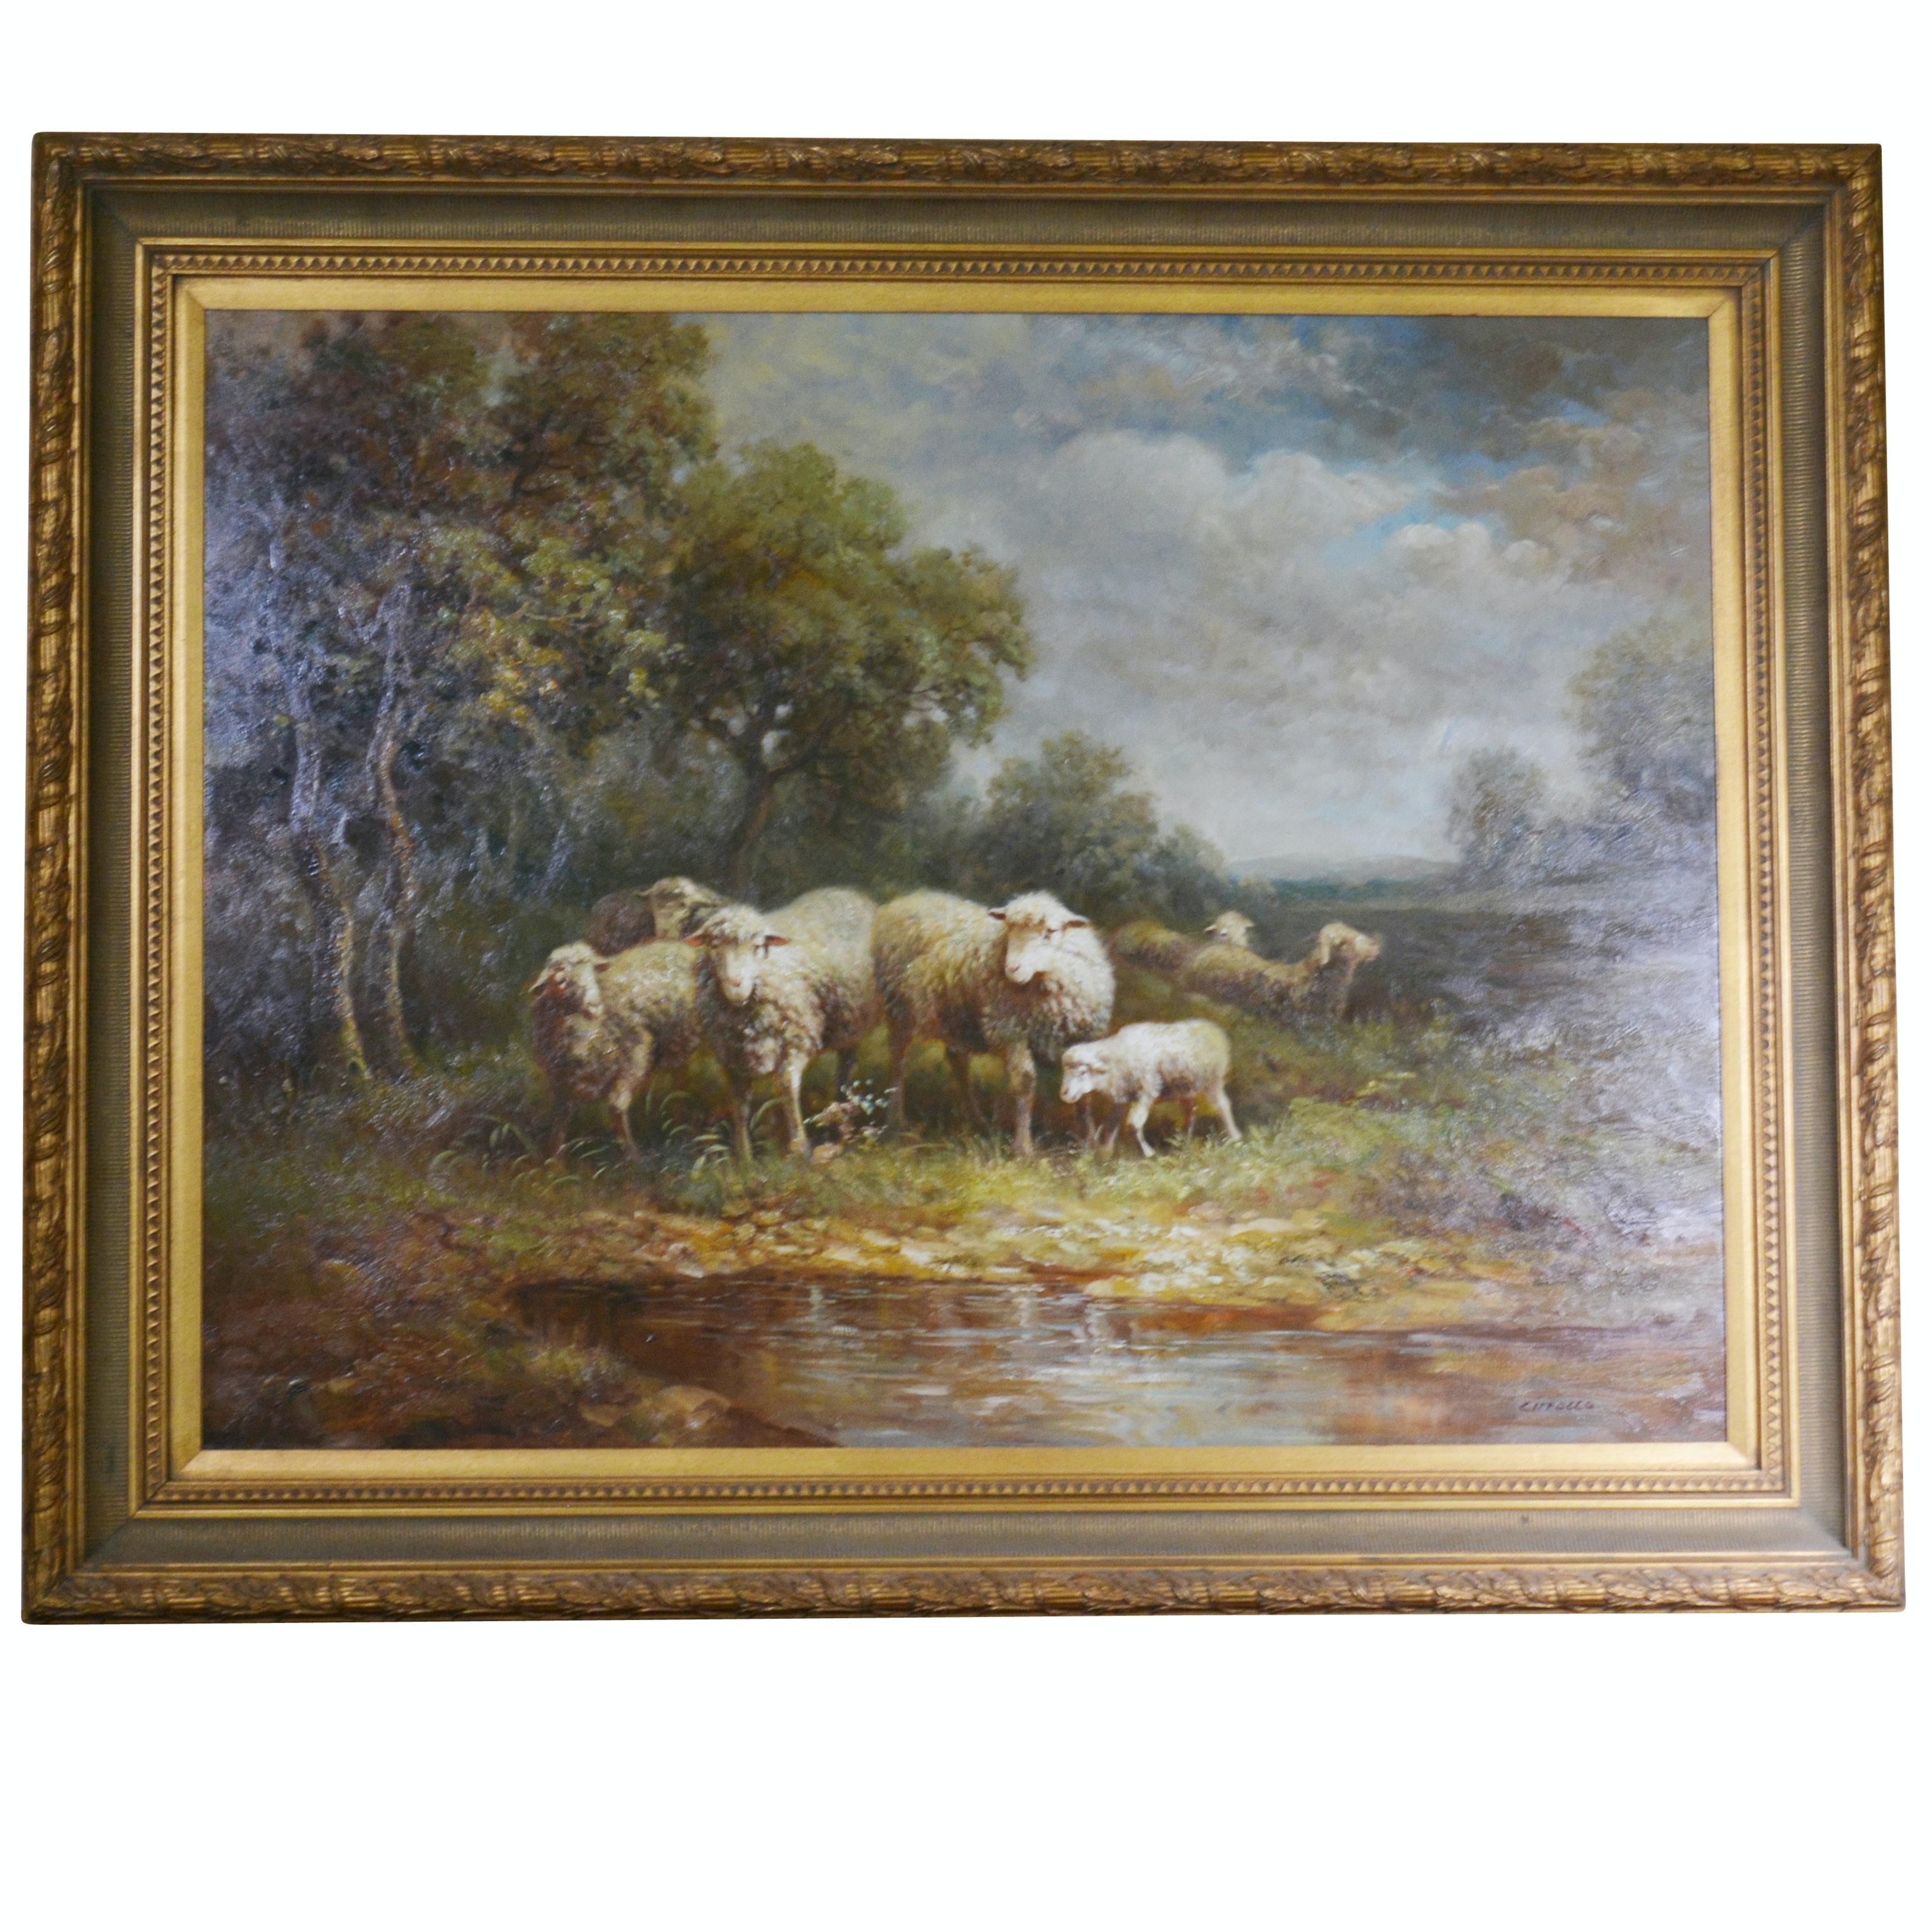 Cirrollo Original Oil Painting of Sheep